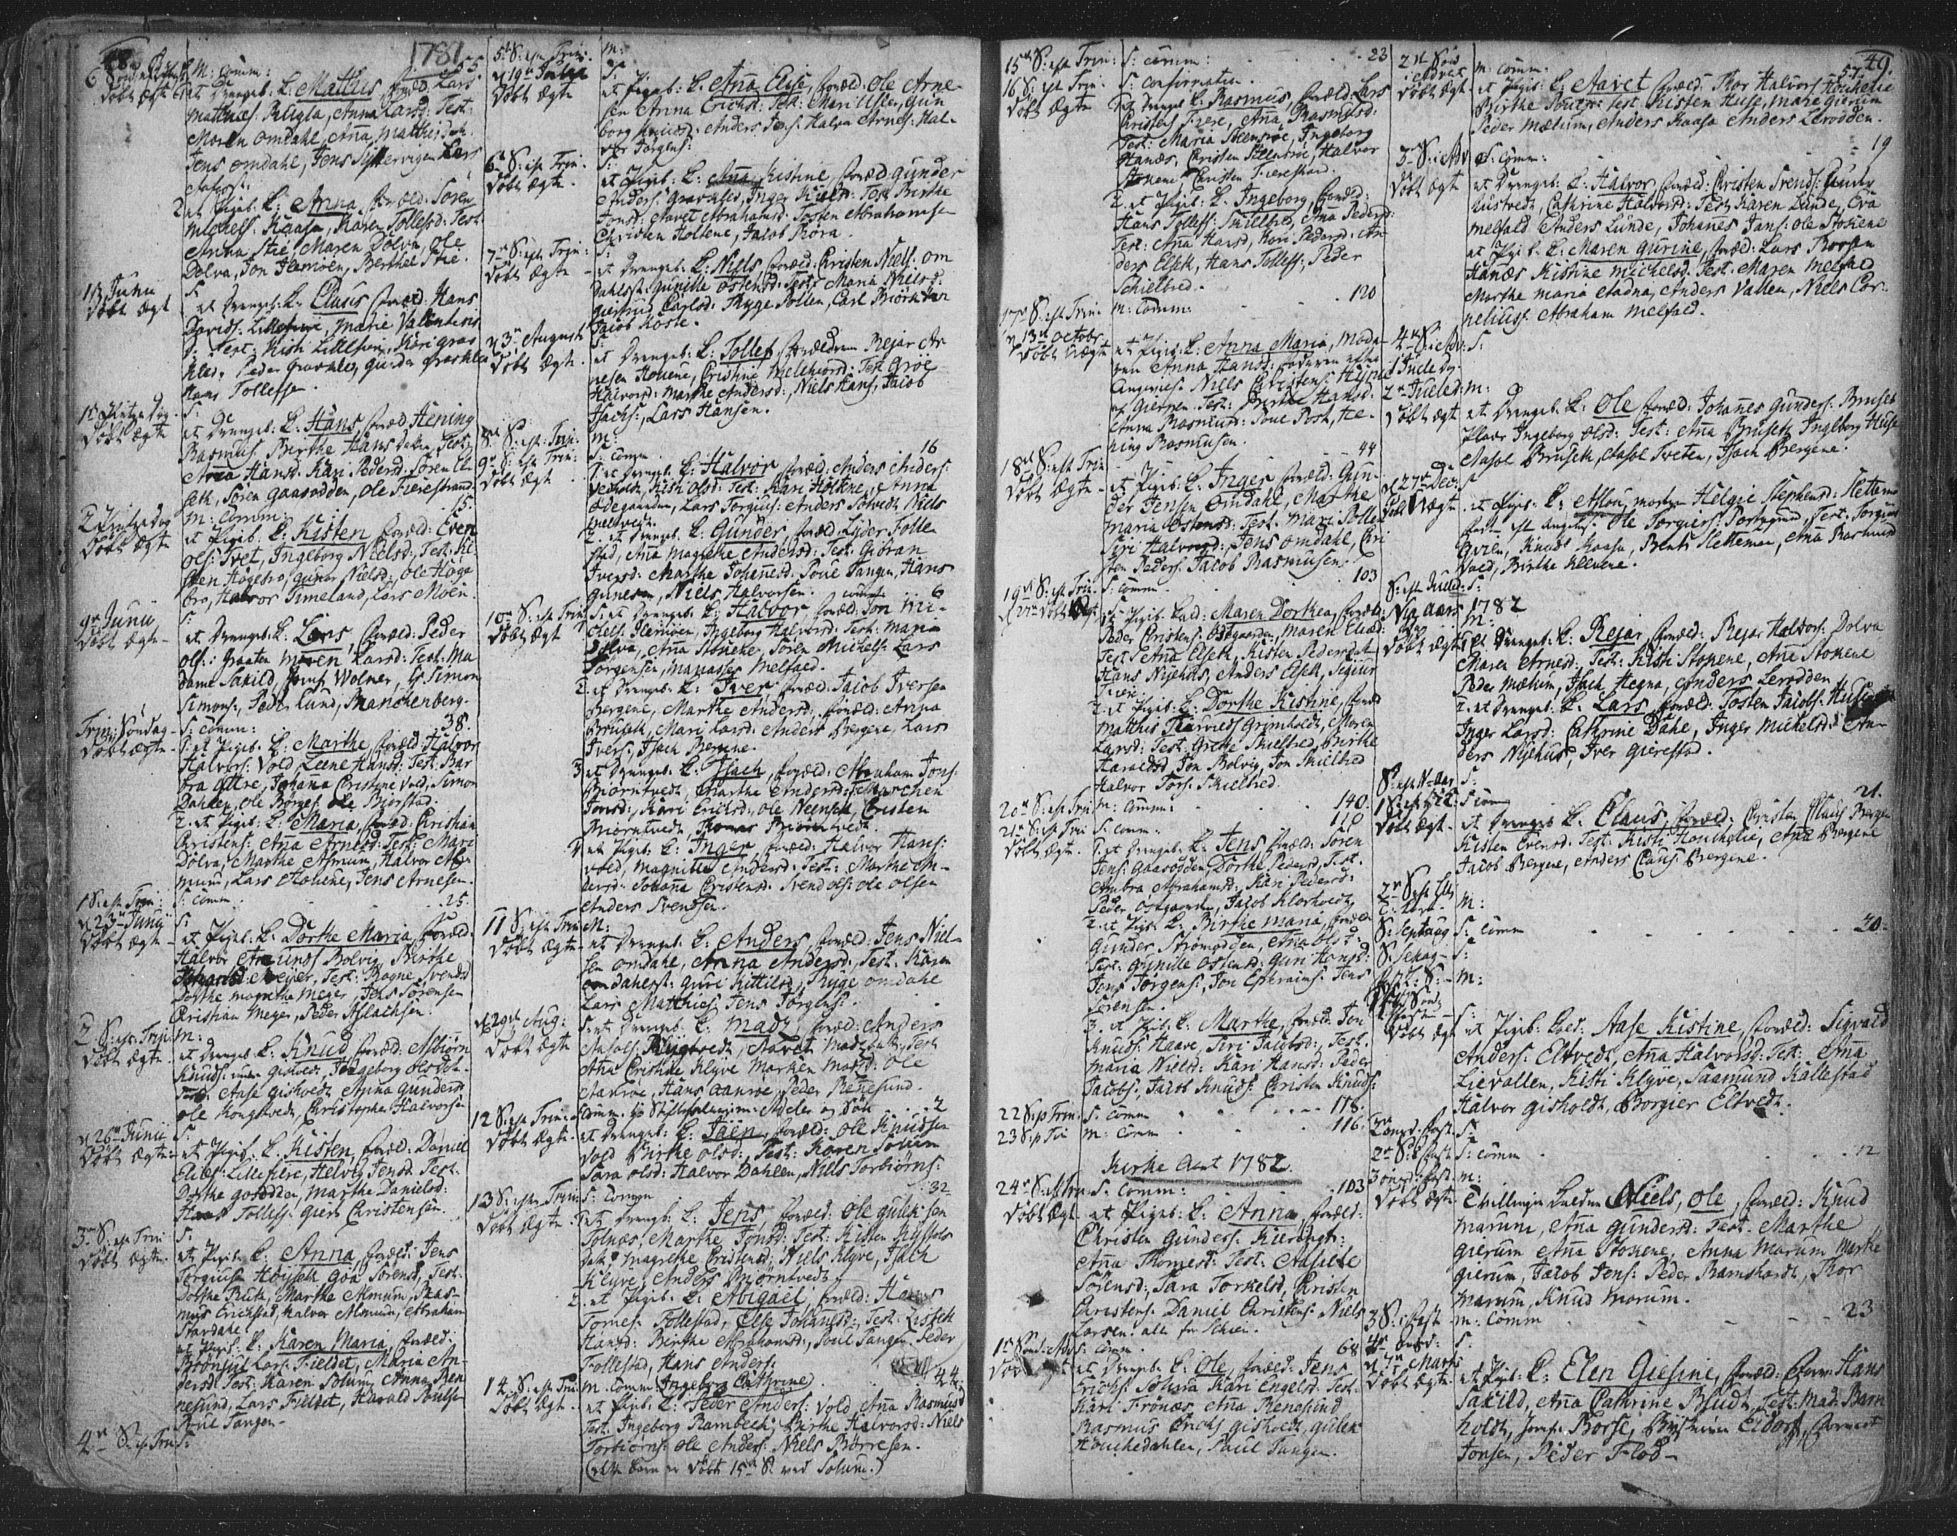 SAKO, Solum kirkebøker, F/Fa/L0003: Ministerialbok nr. I 3, 1761-1814, s. 48-49